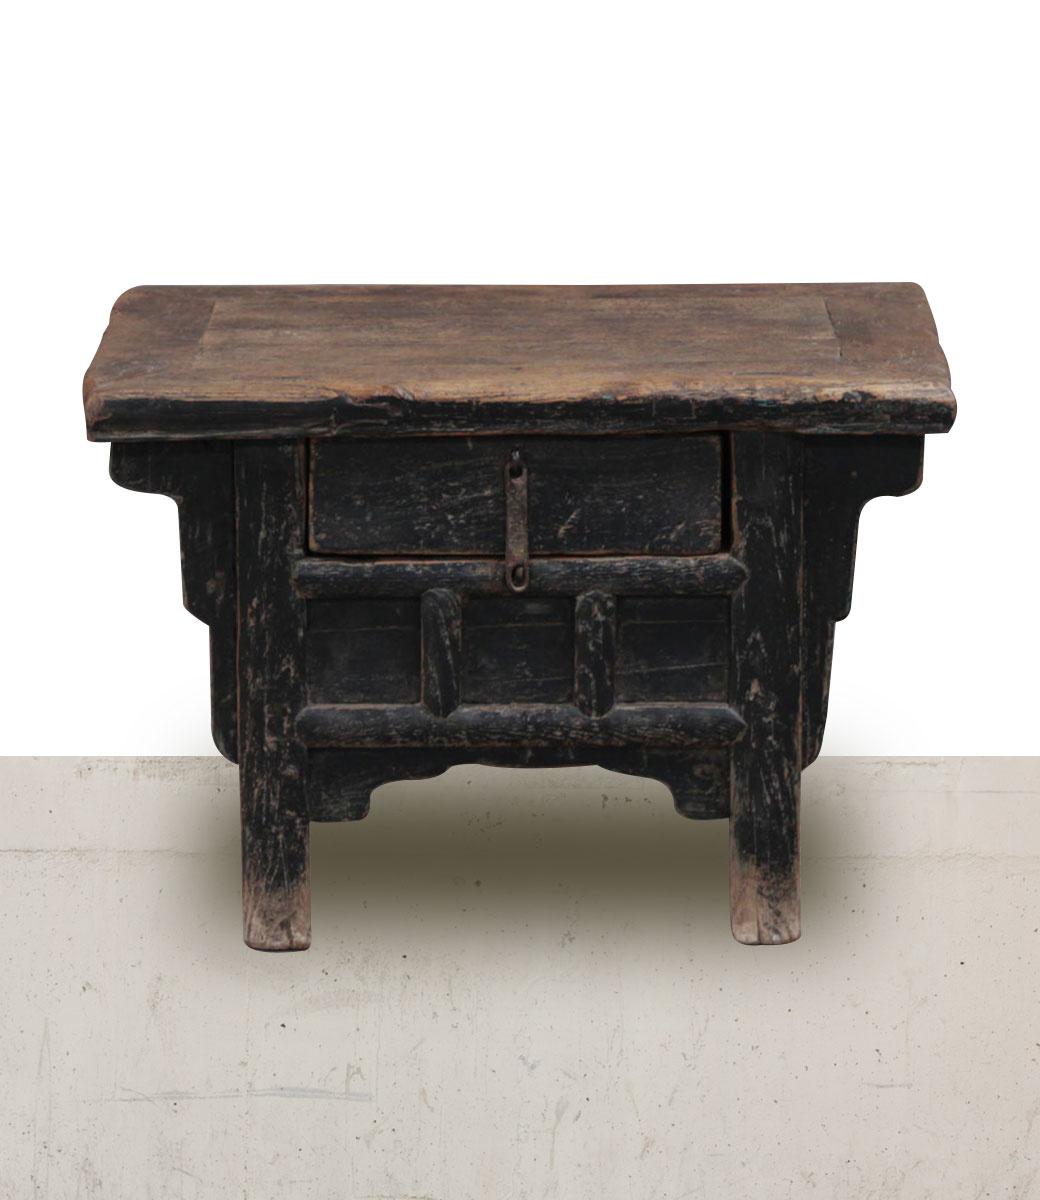 Petite Lily Interiors black raw wood side table - 65x44xh44cm - Unique Item